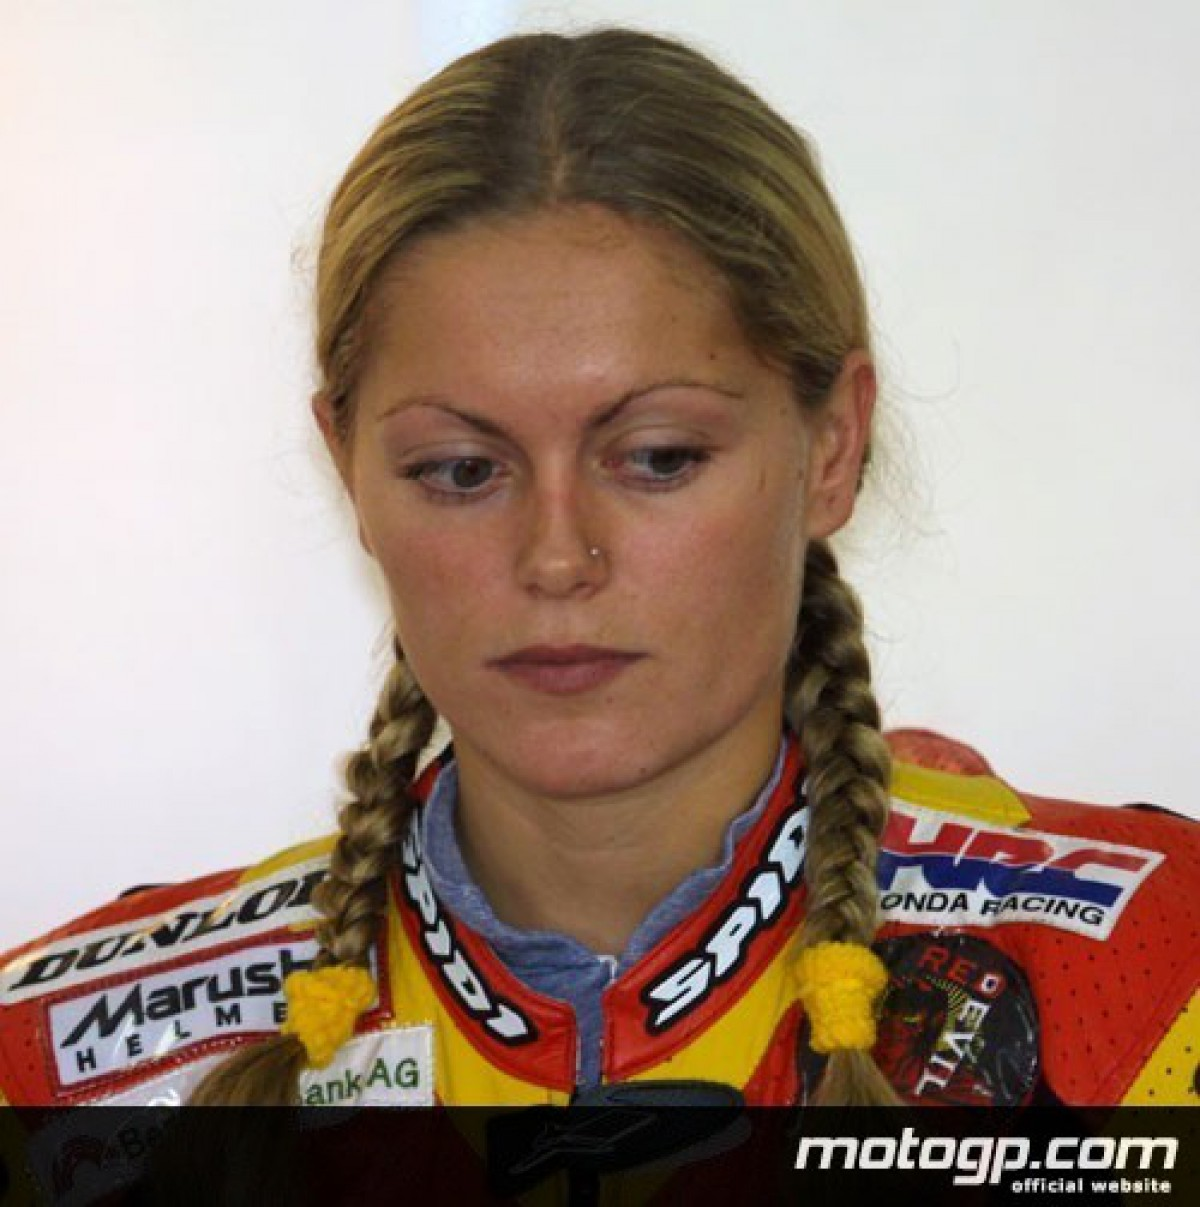 Katja Poensgen looking for her fourth team in 13 months | MotoGP™